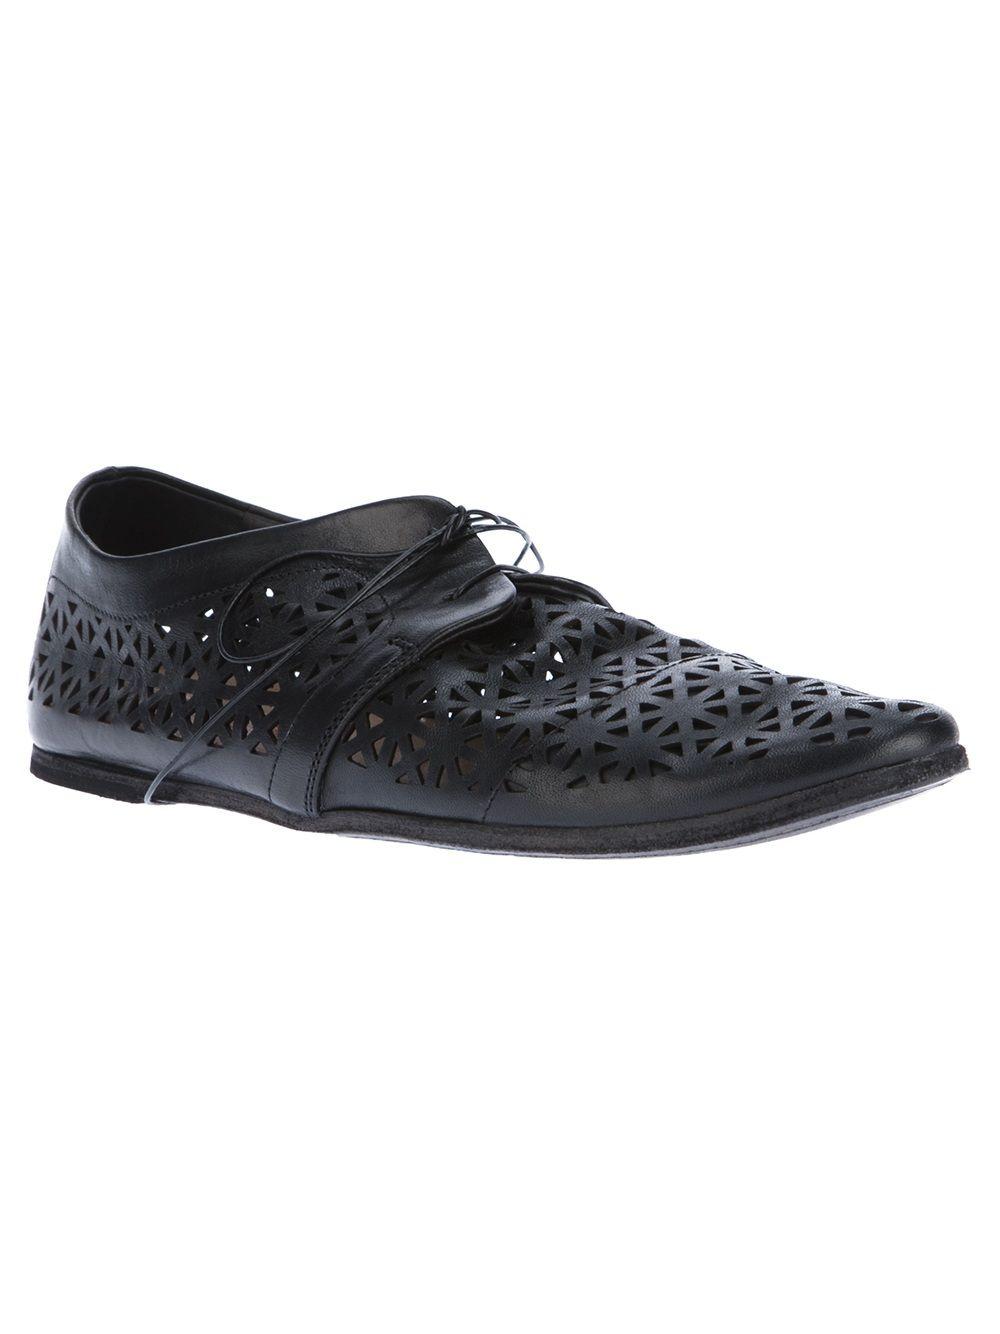 Marsèll Black Studded Loafers